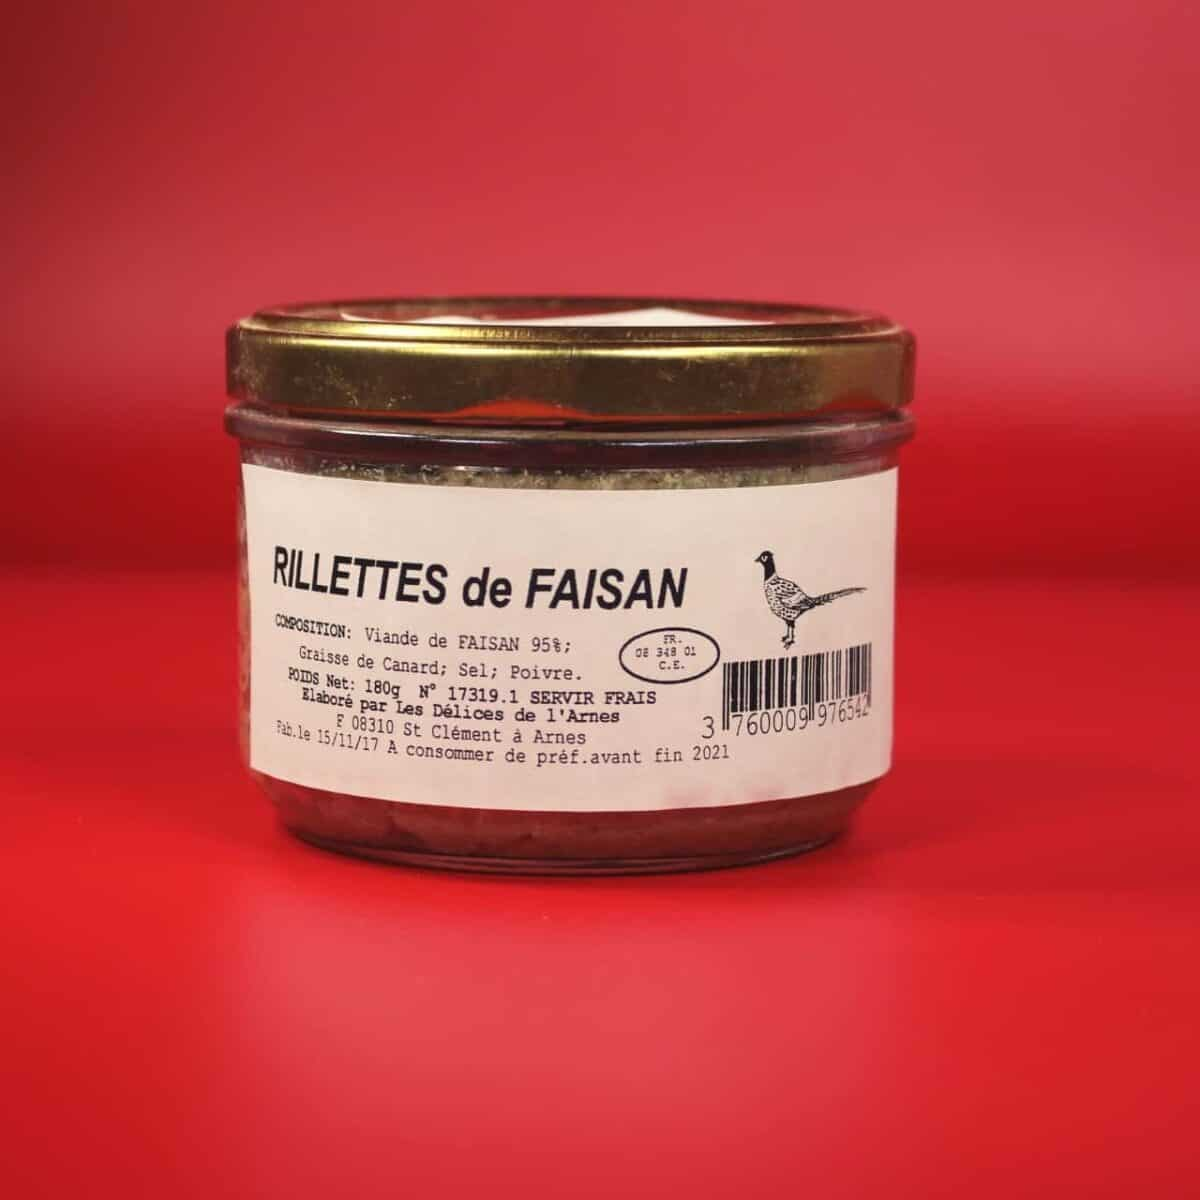 Rillettes Faisan, Ardennes, Terroir, Délice, Arnes